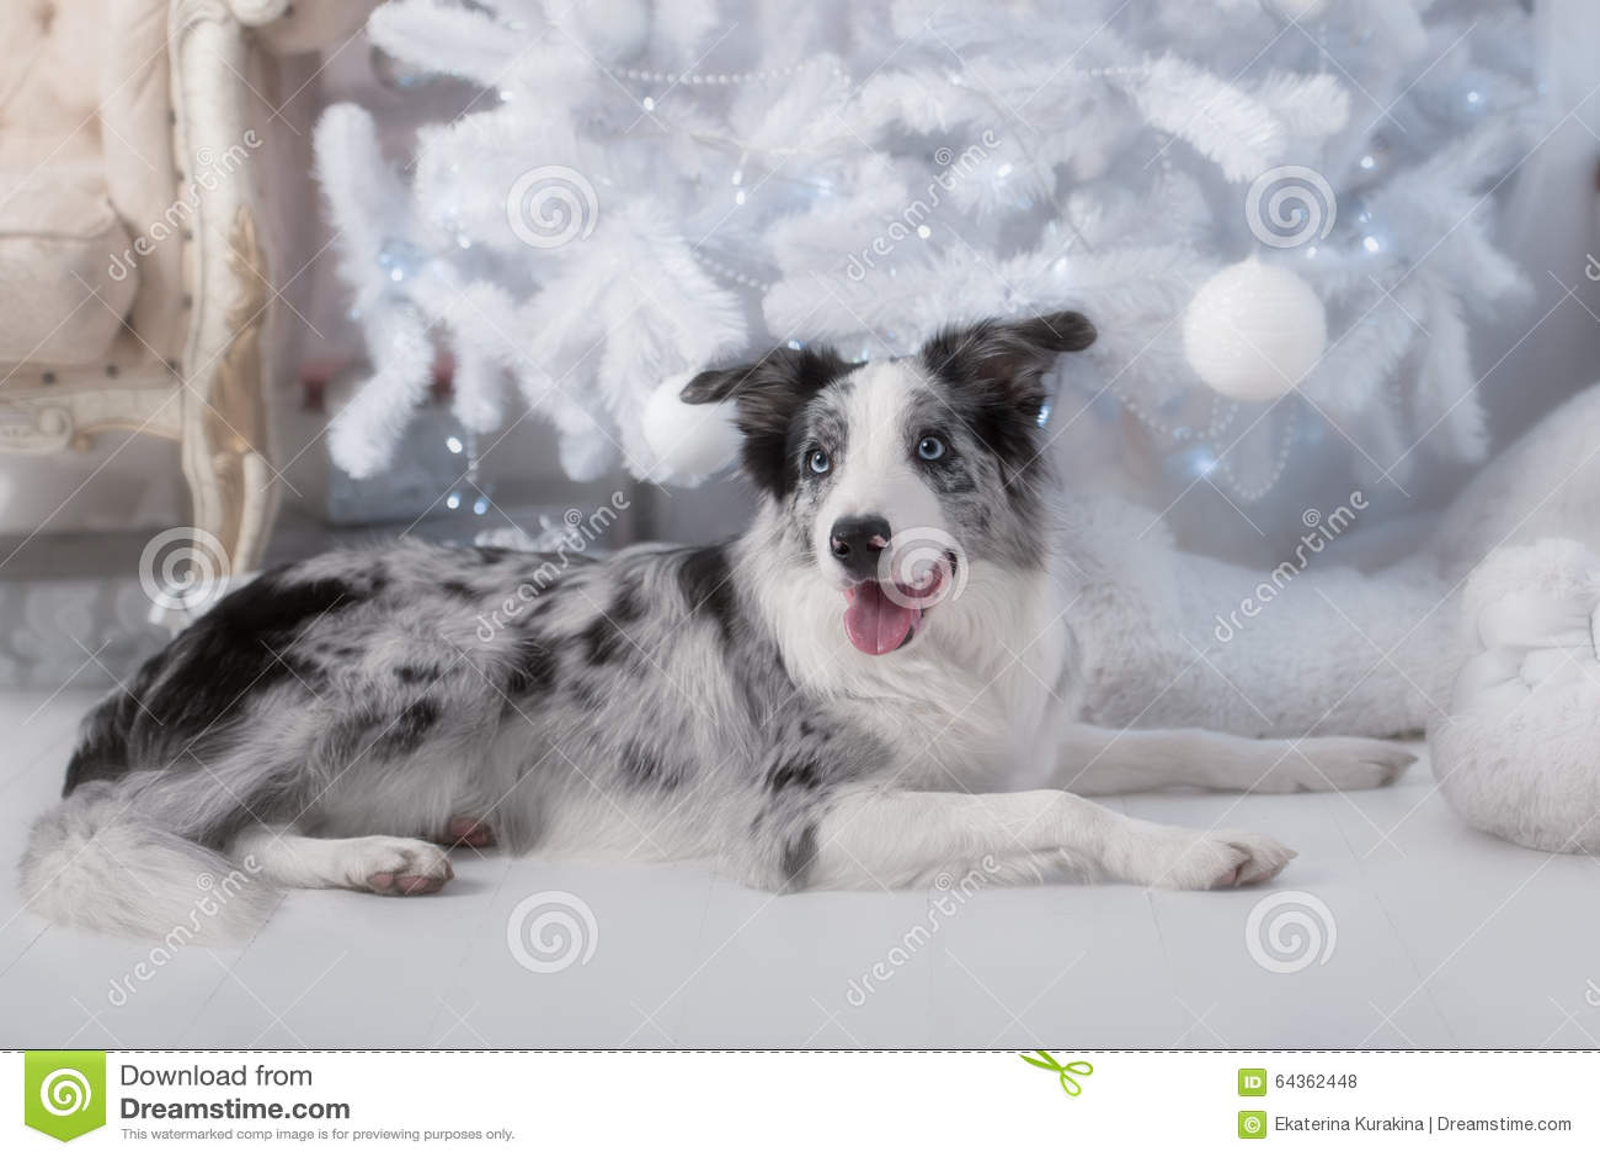 Border collie dog lying down on white Christmas